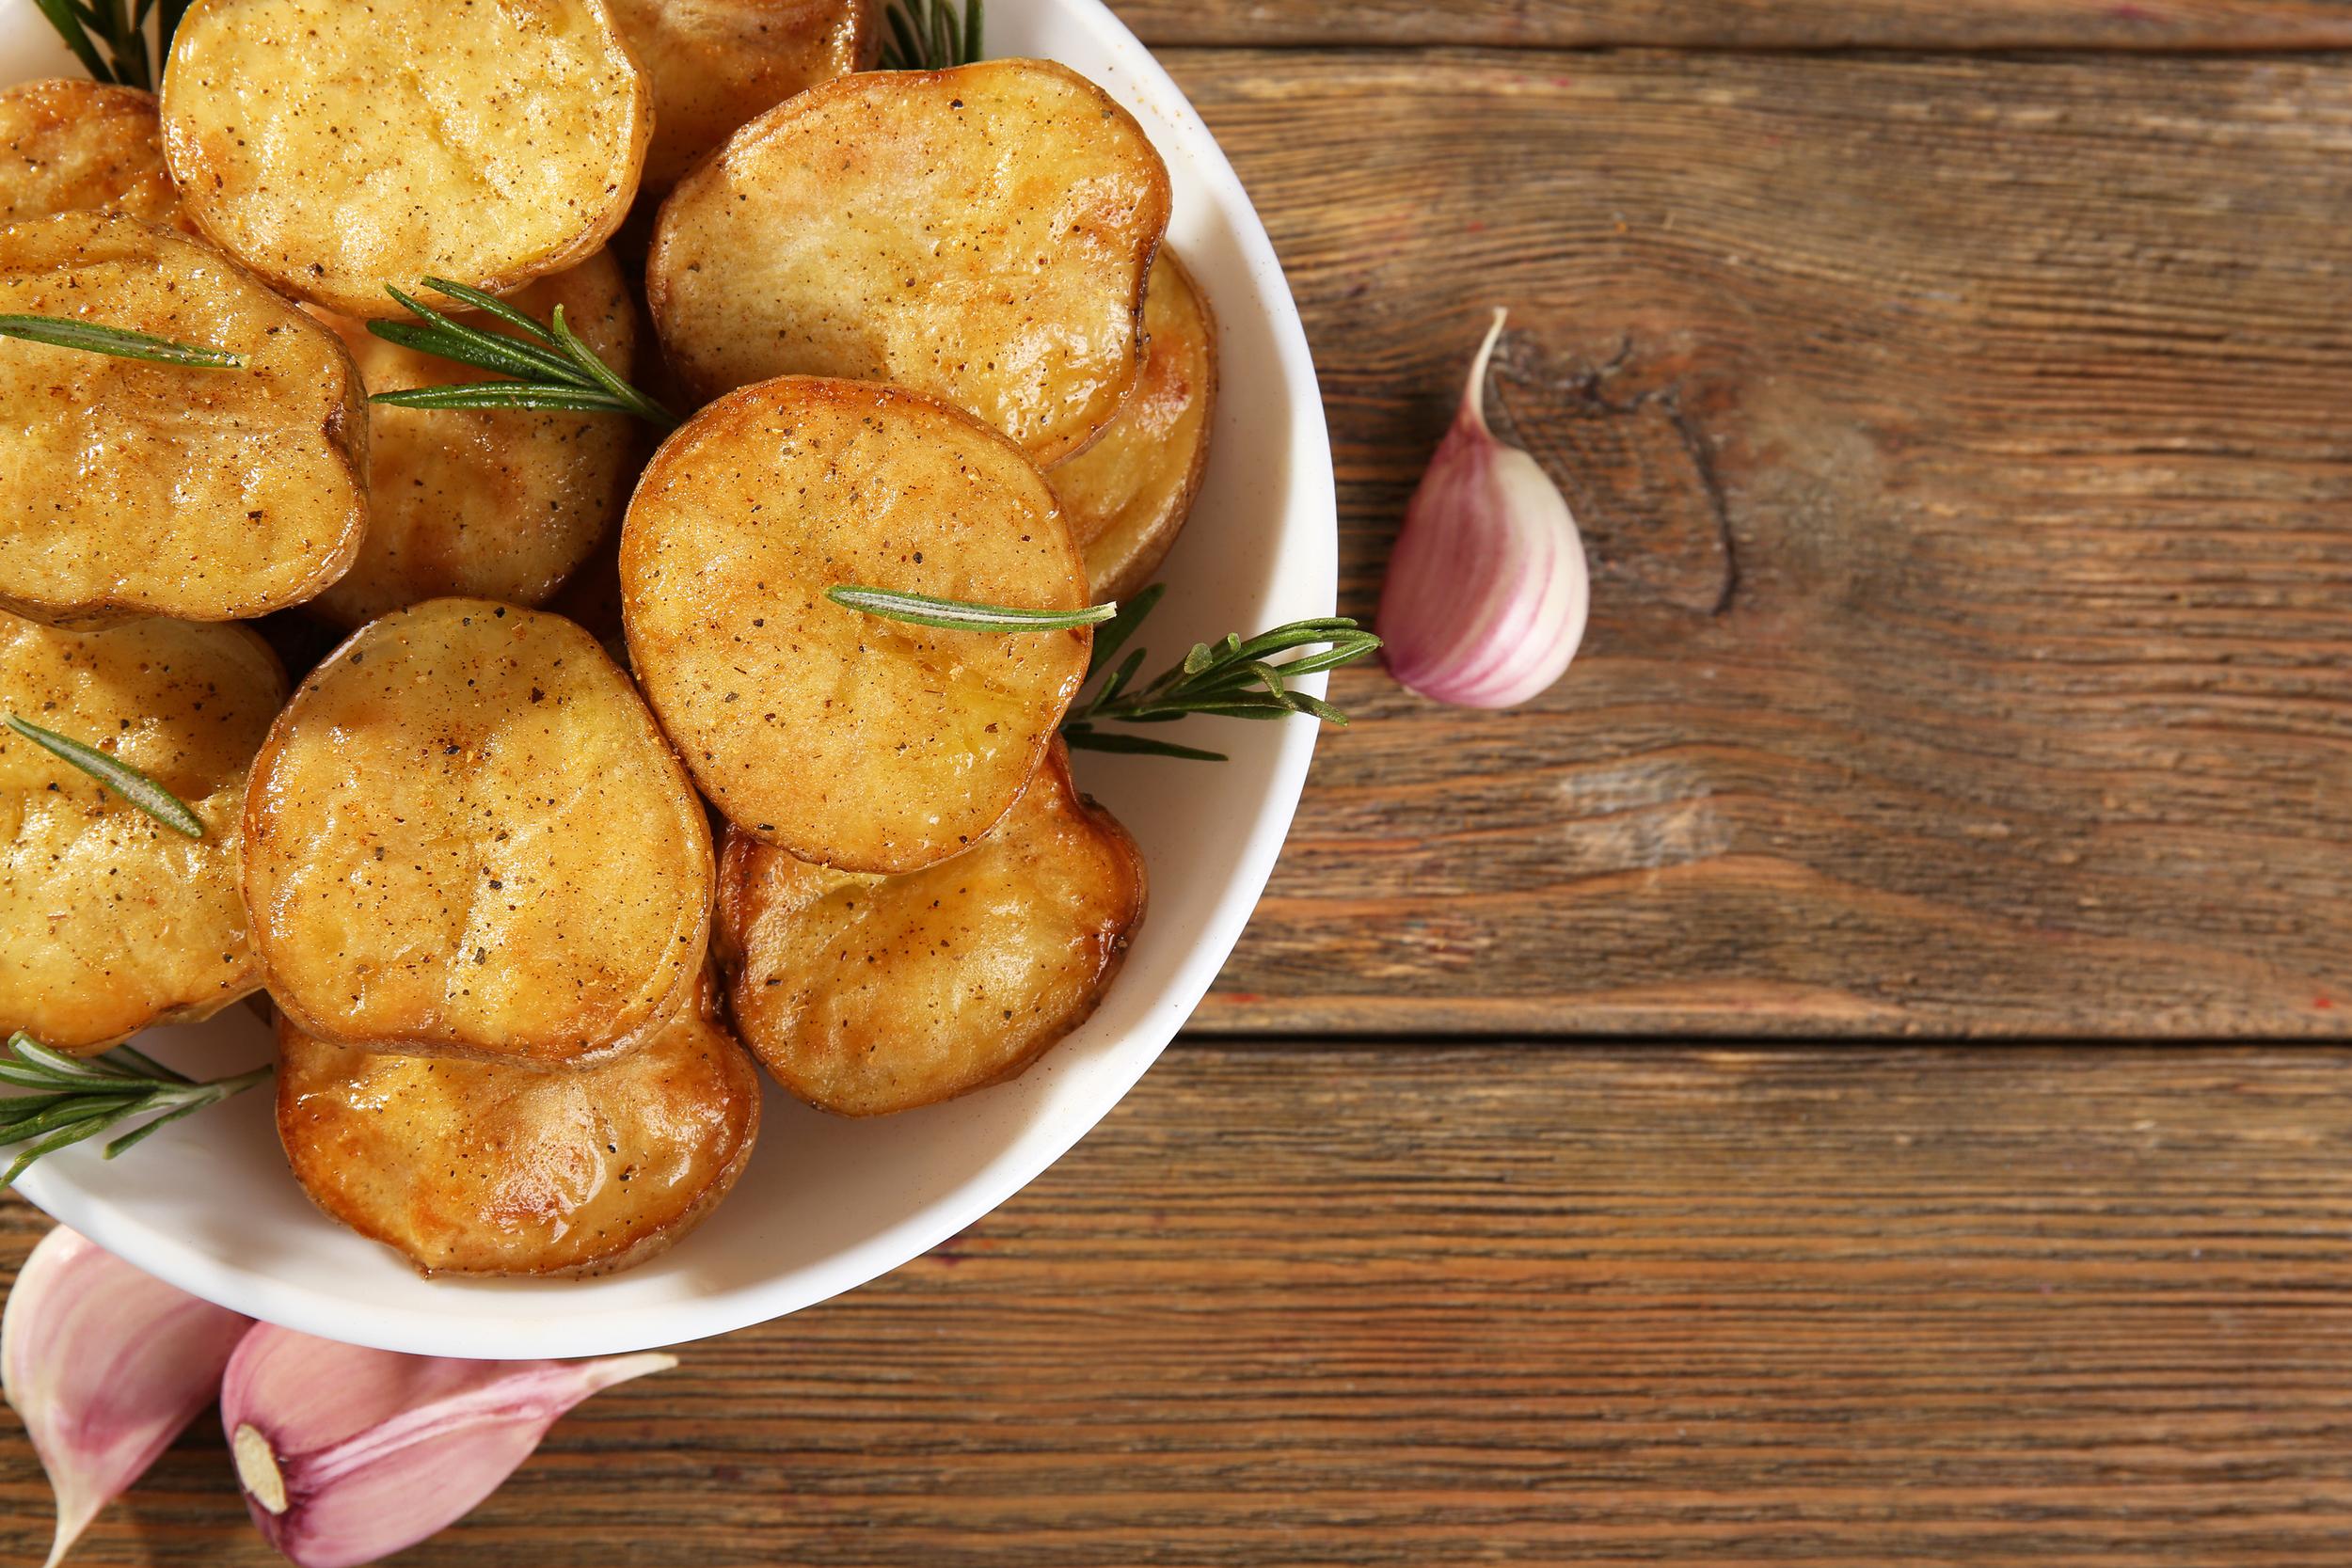 bigstock-Delicious-baked-potato-with-ro-111085997.jpg